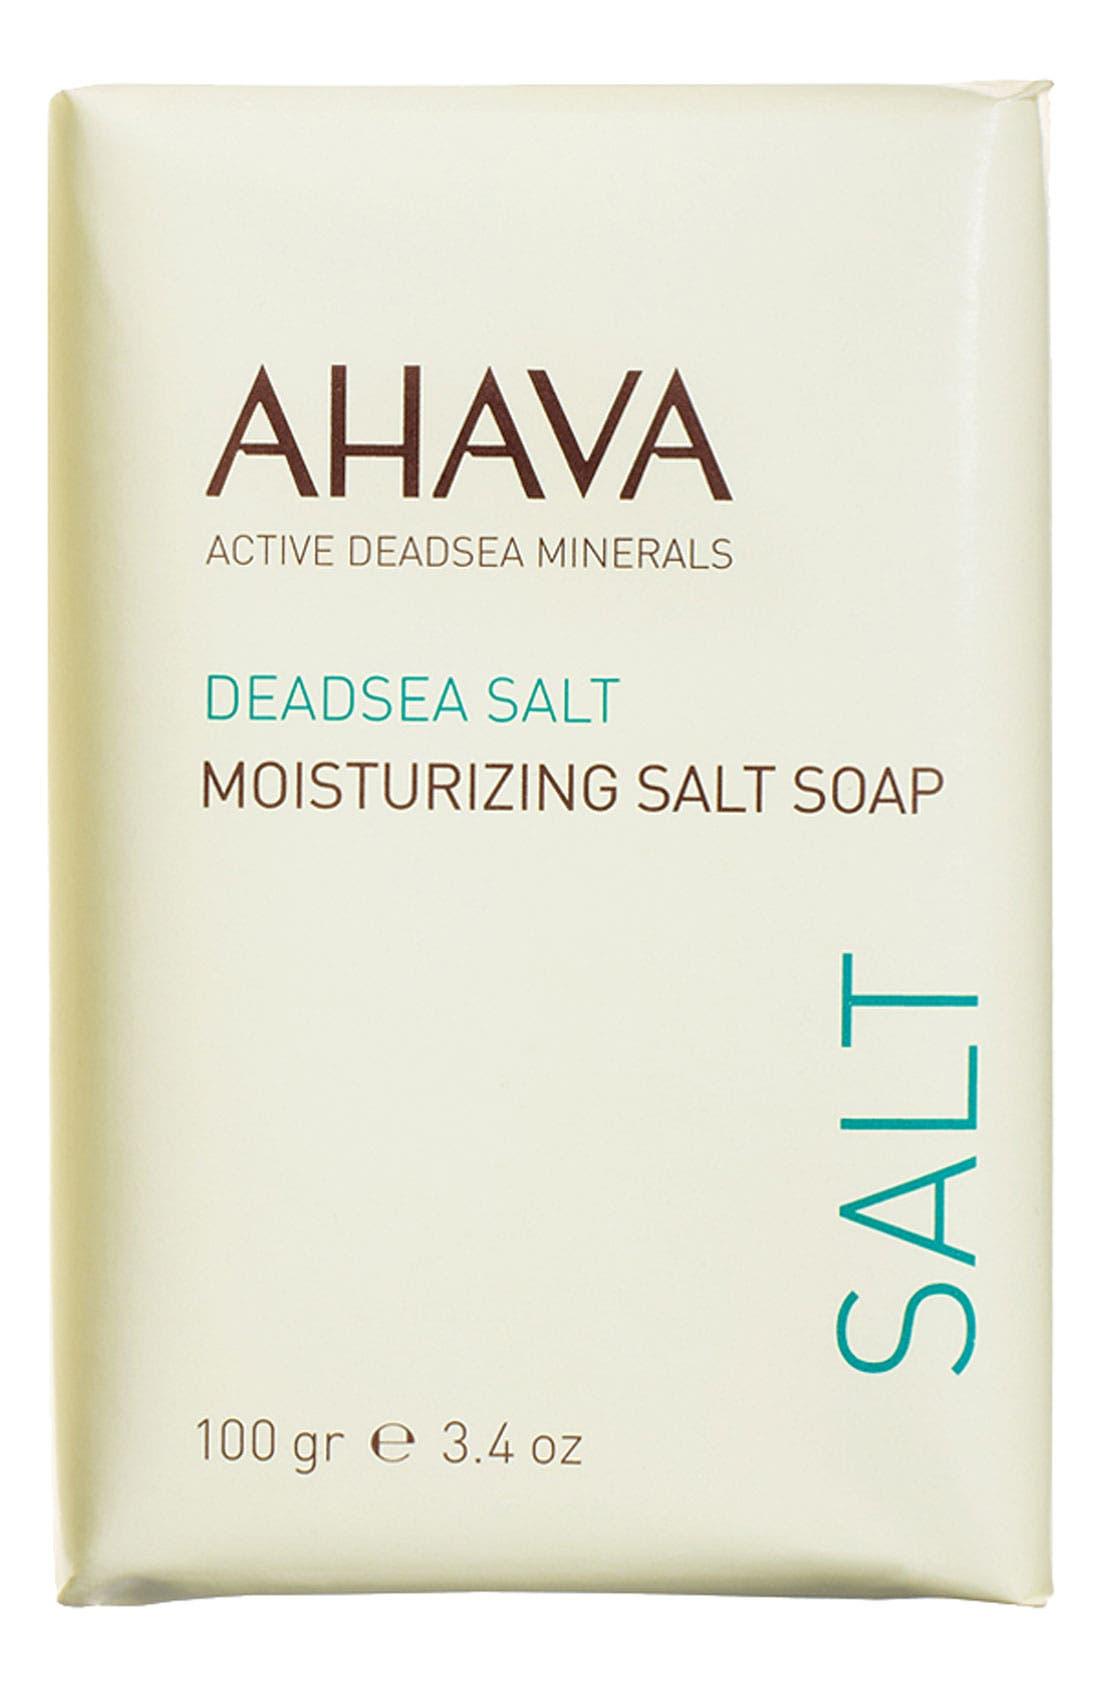 AHAVA Moisturizing Salt Soap